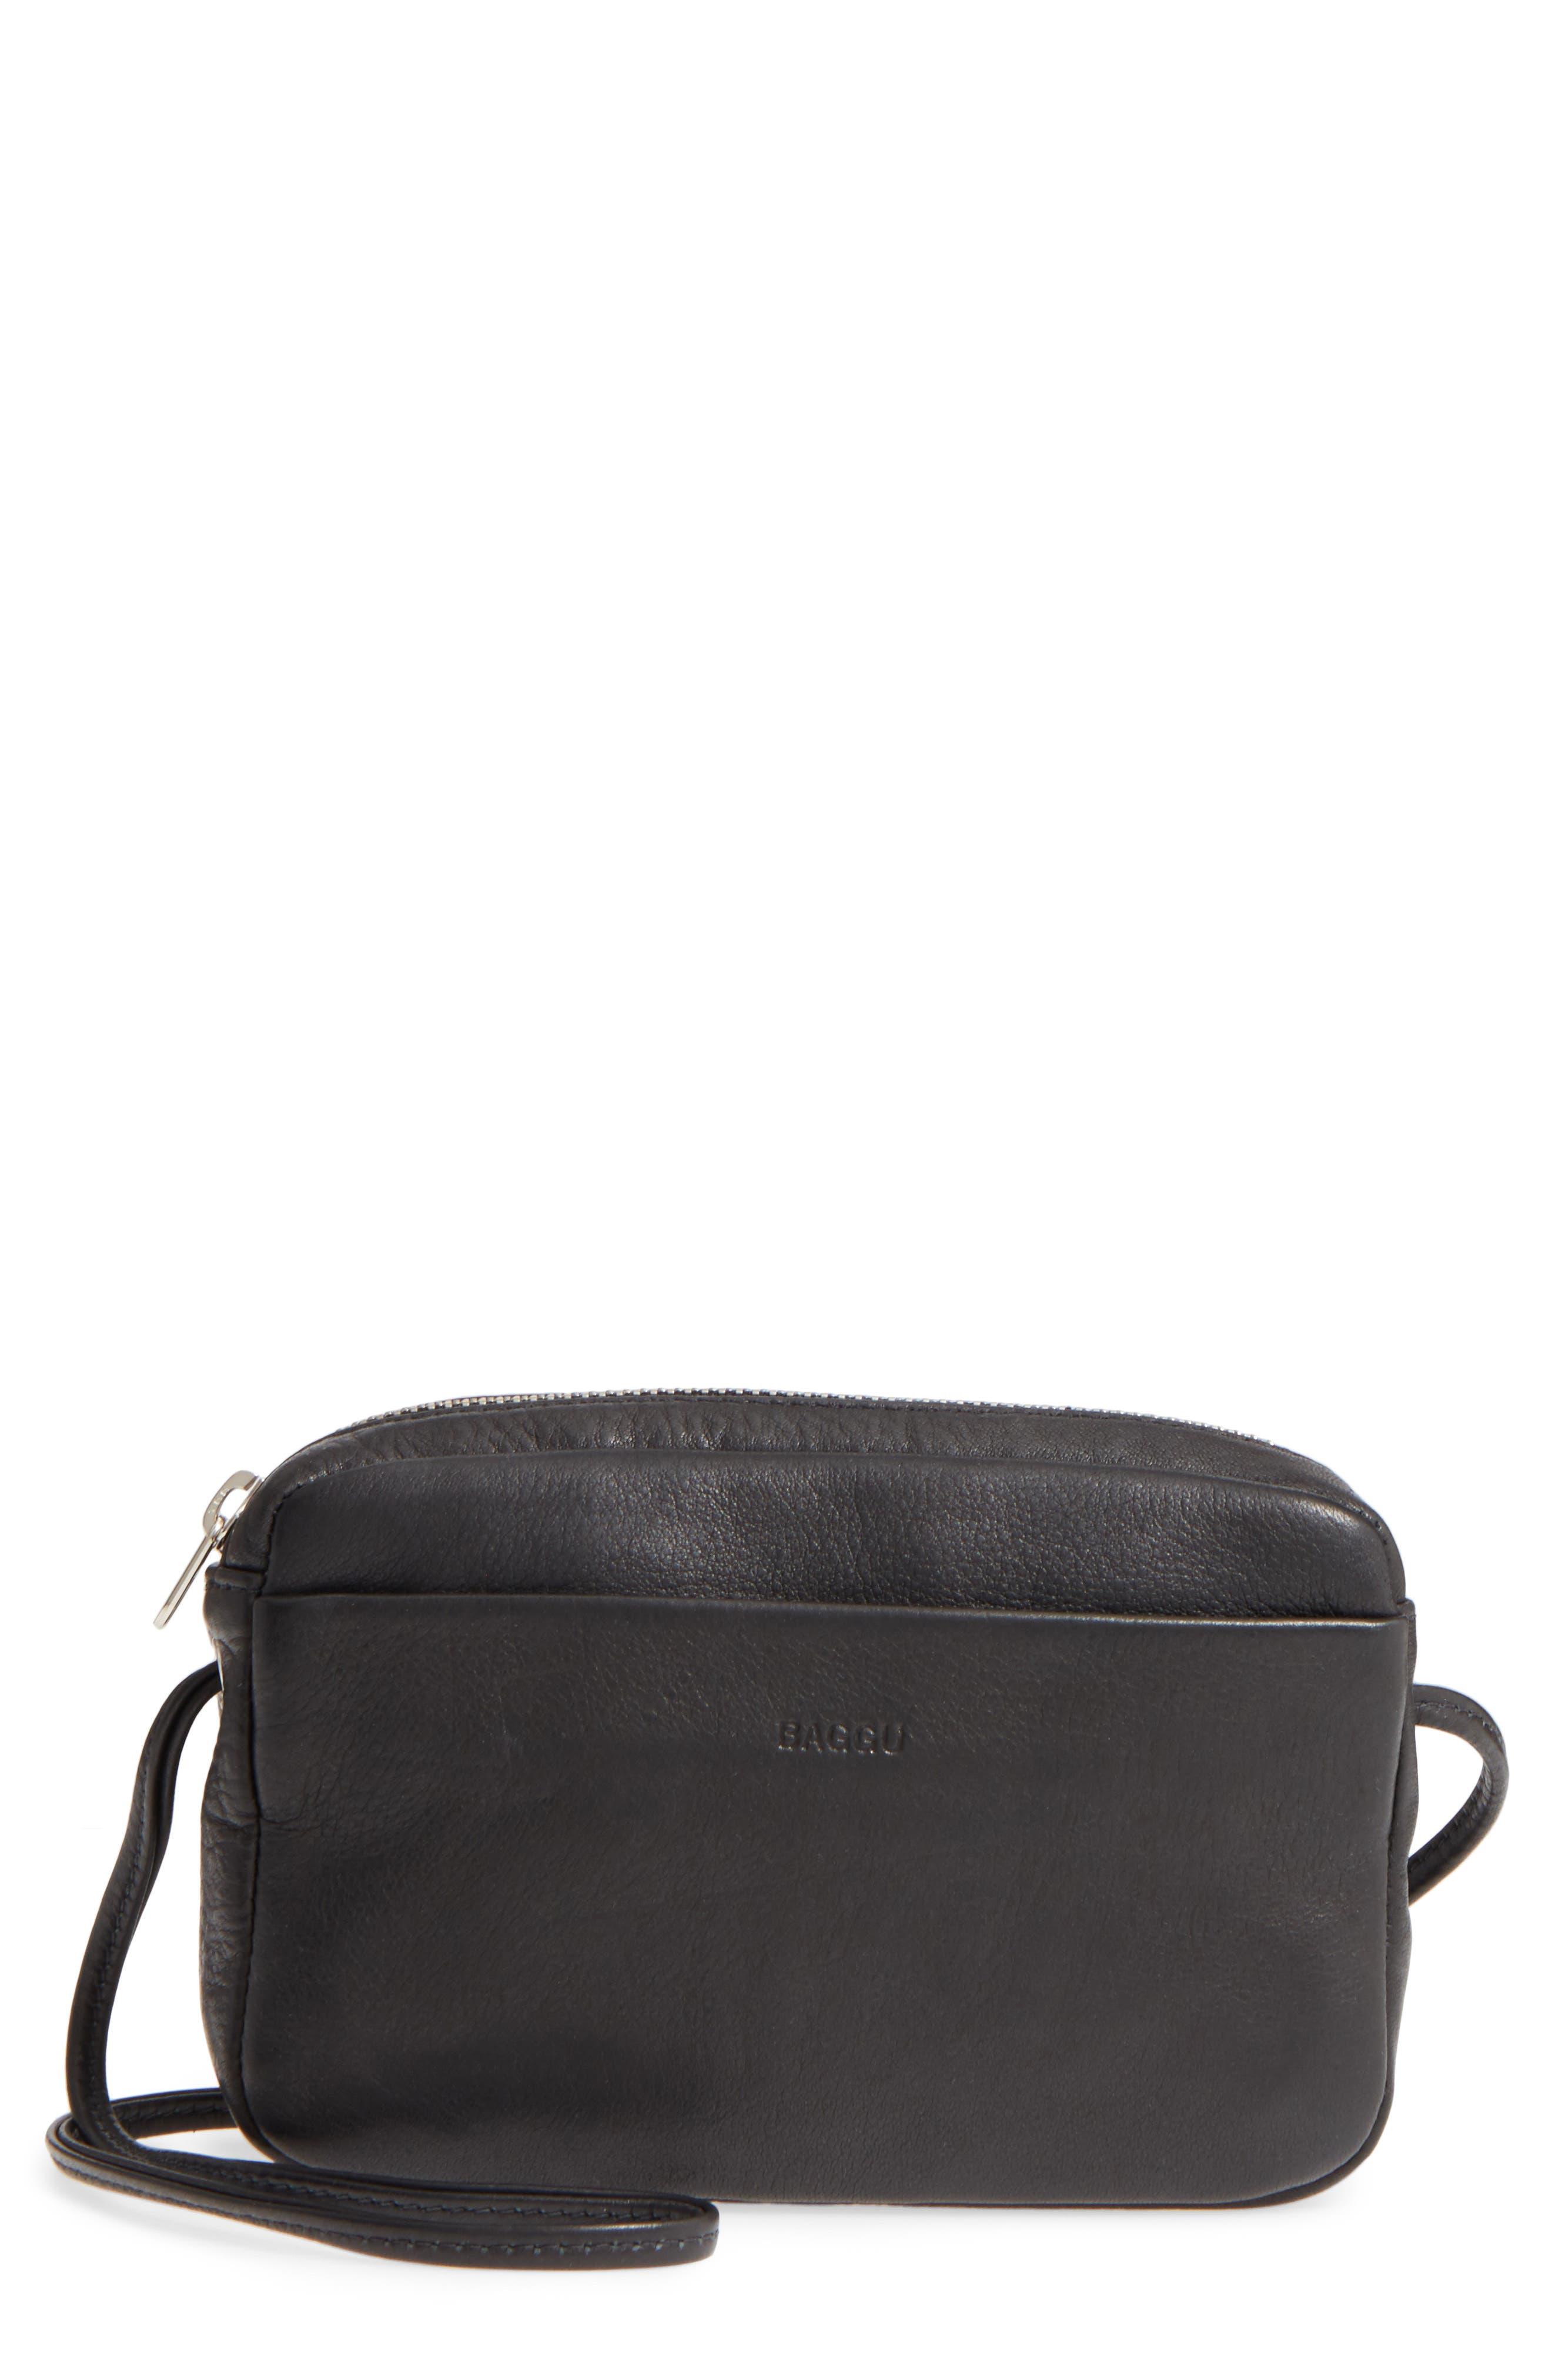 'Mini' Pebbled Leather Crossbody,                         Main,                         color, 005